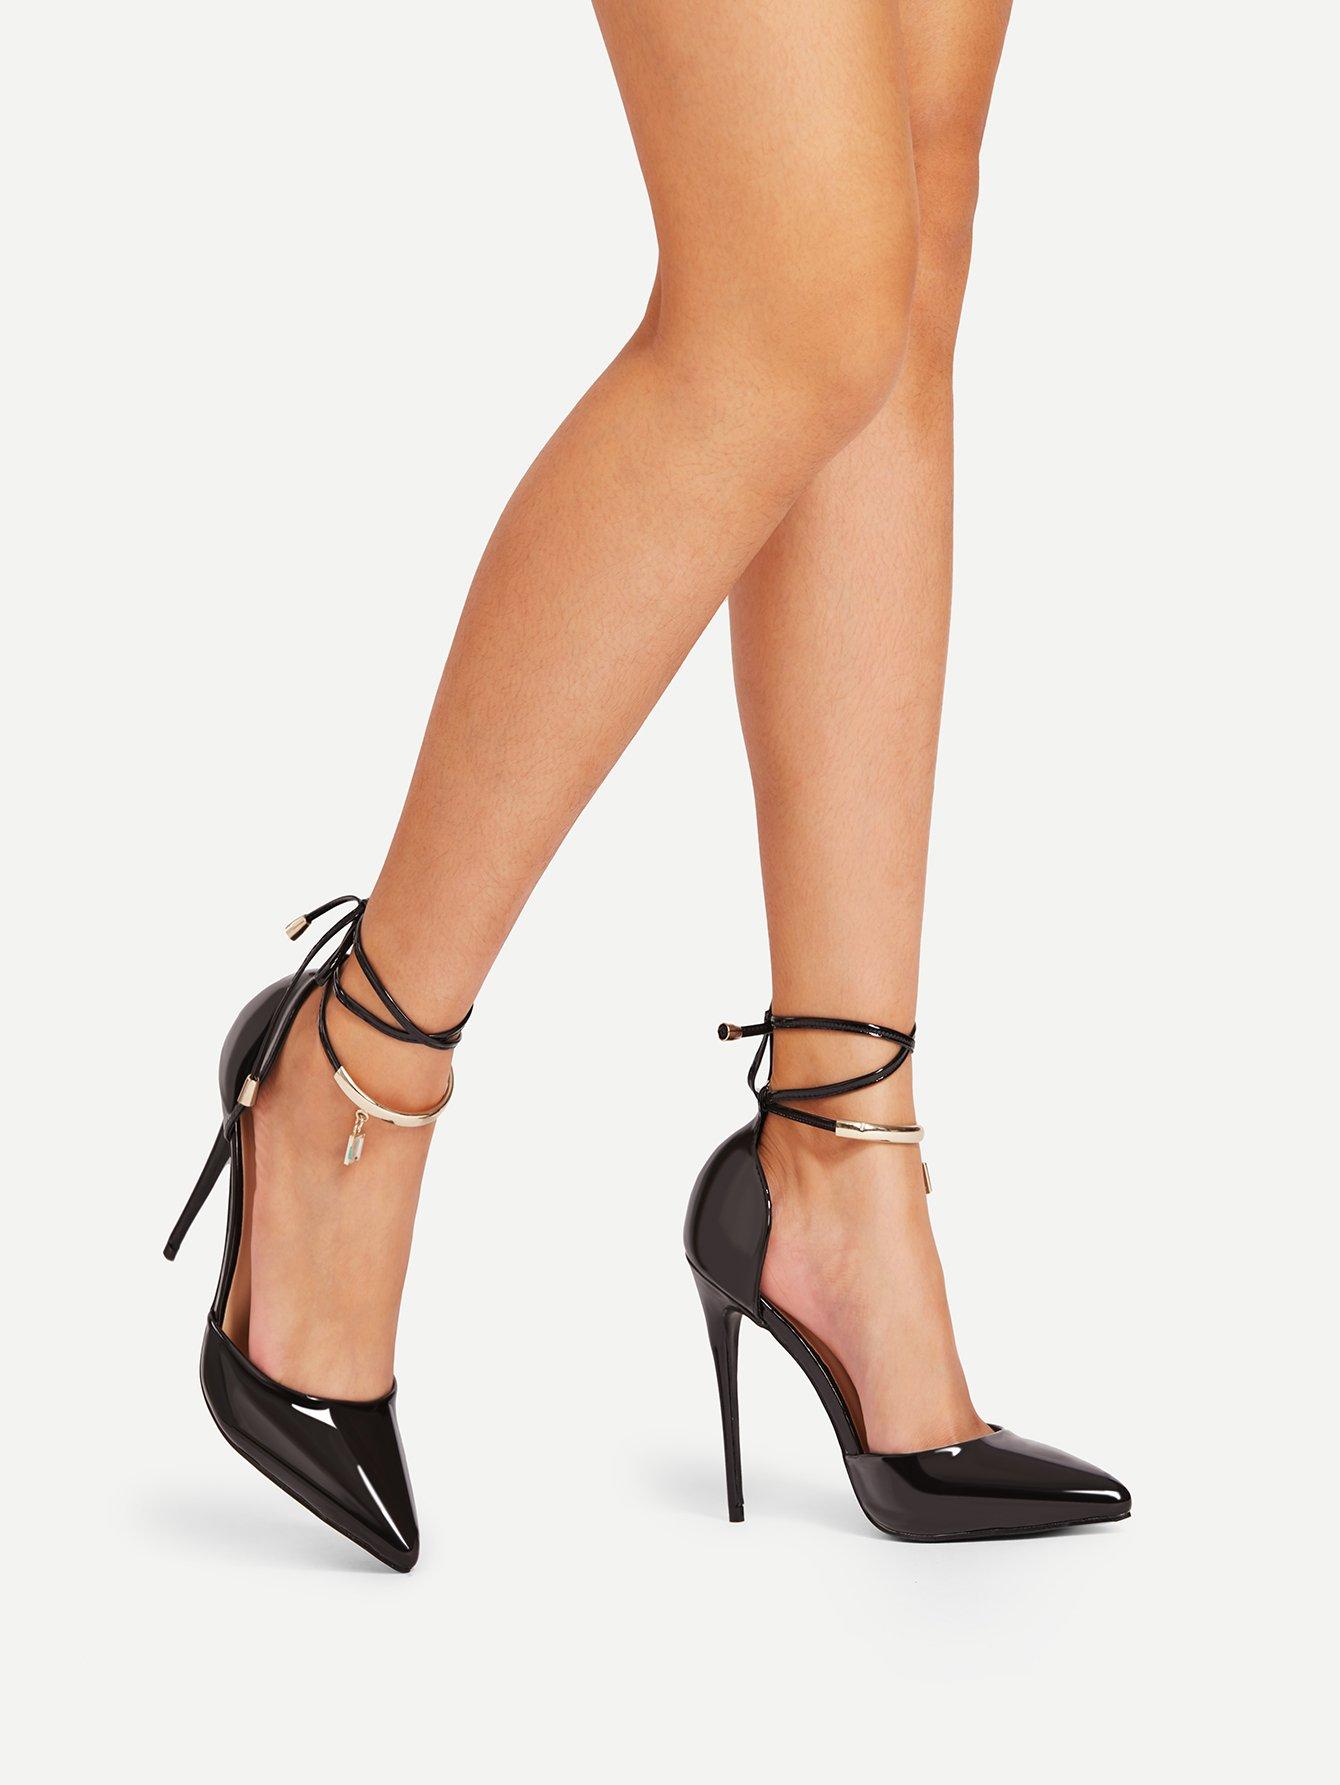 Pointed Toe Tie Leg Stiletto Heels pointed toe tie leg flats